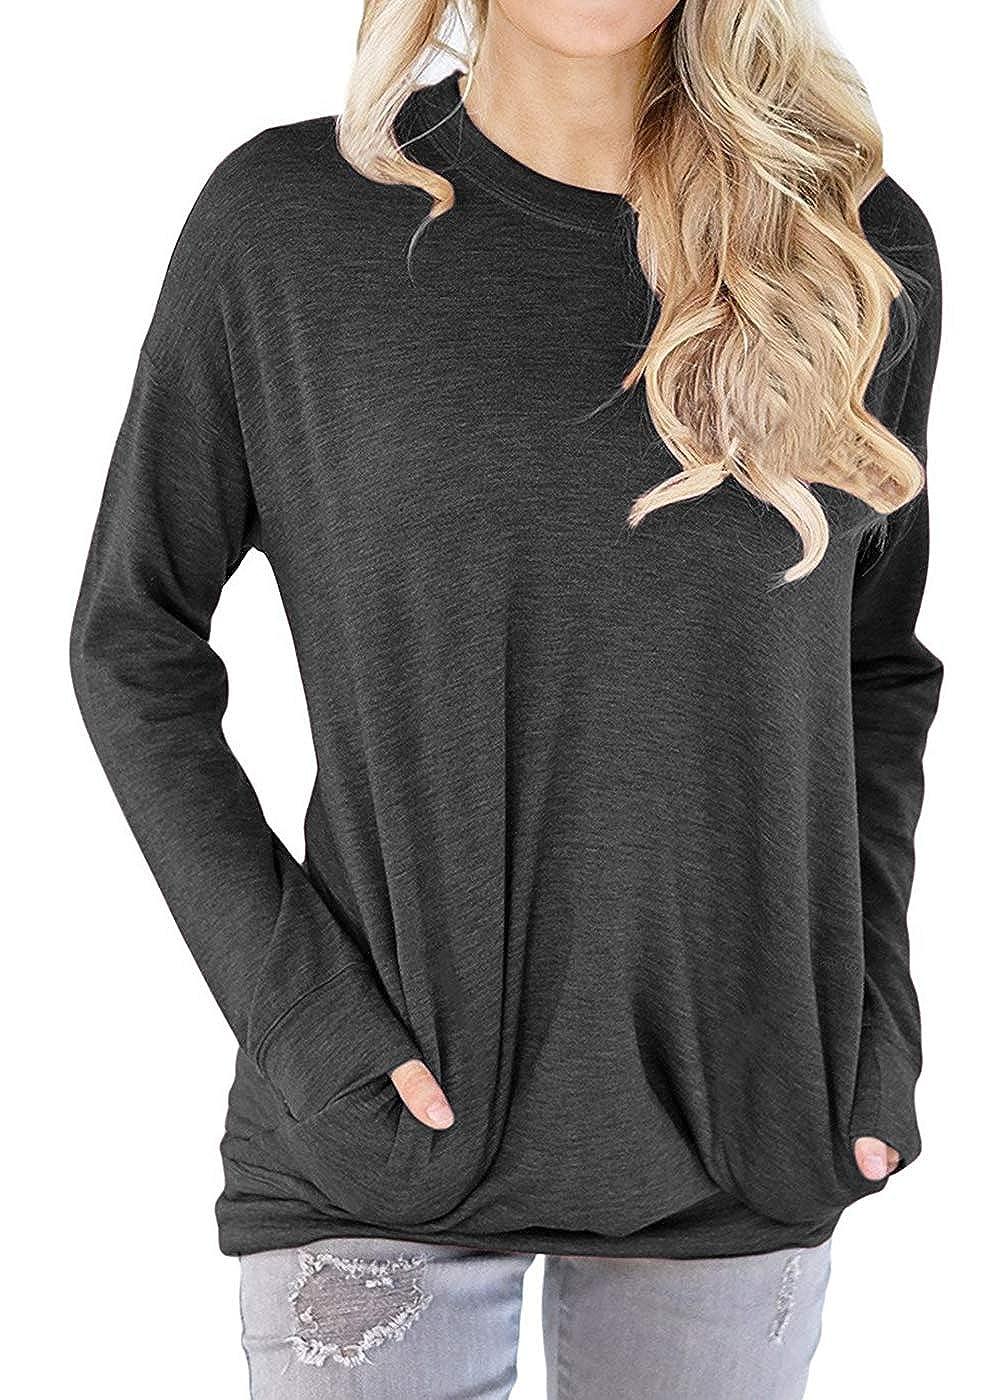 b24580cf077 TWKIOUE Women s Casual Long Sleeve Round Neck Sweatshirt Loose Pullover Tunic  Tops at Amazon Women s Clothing store